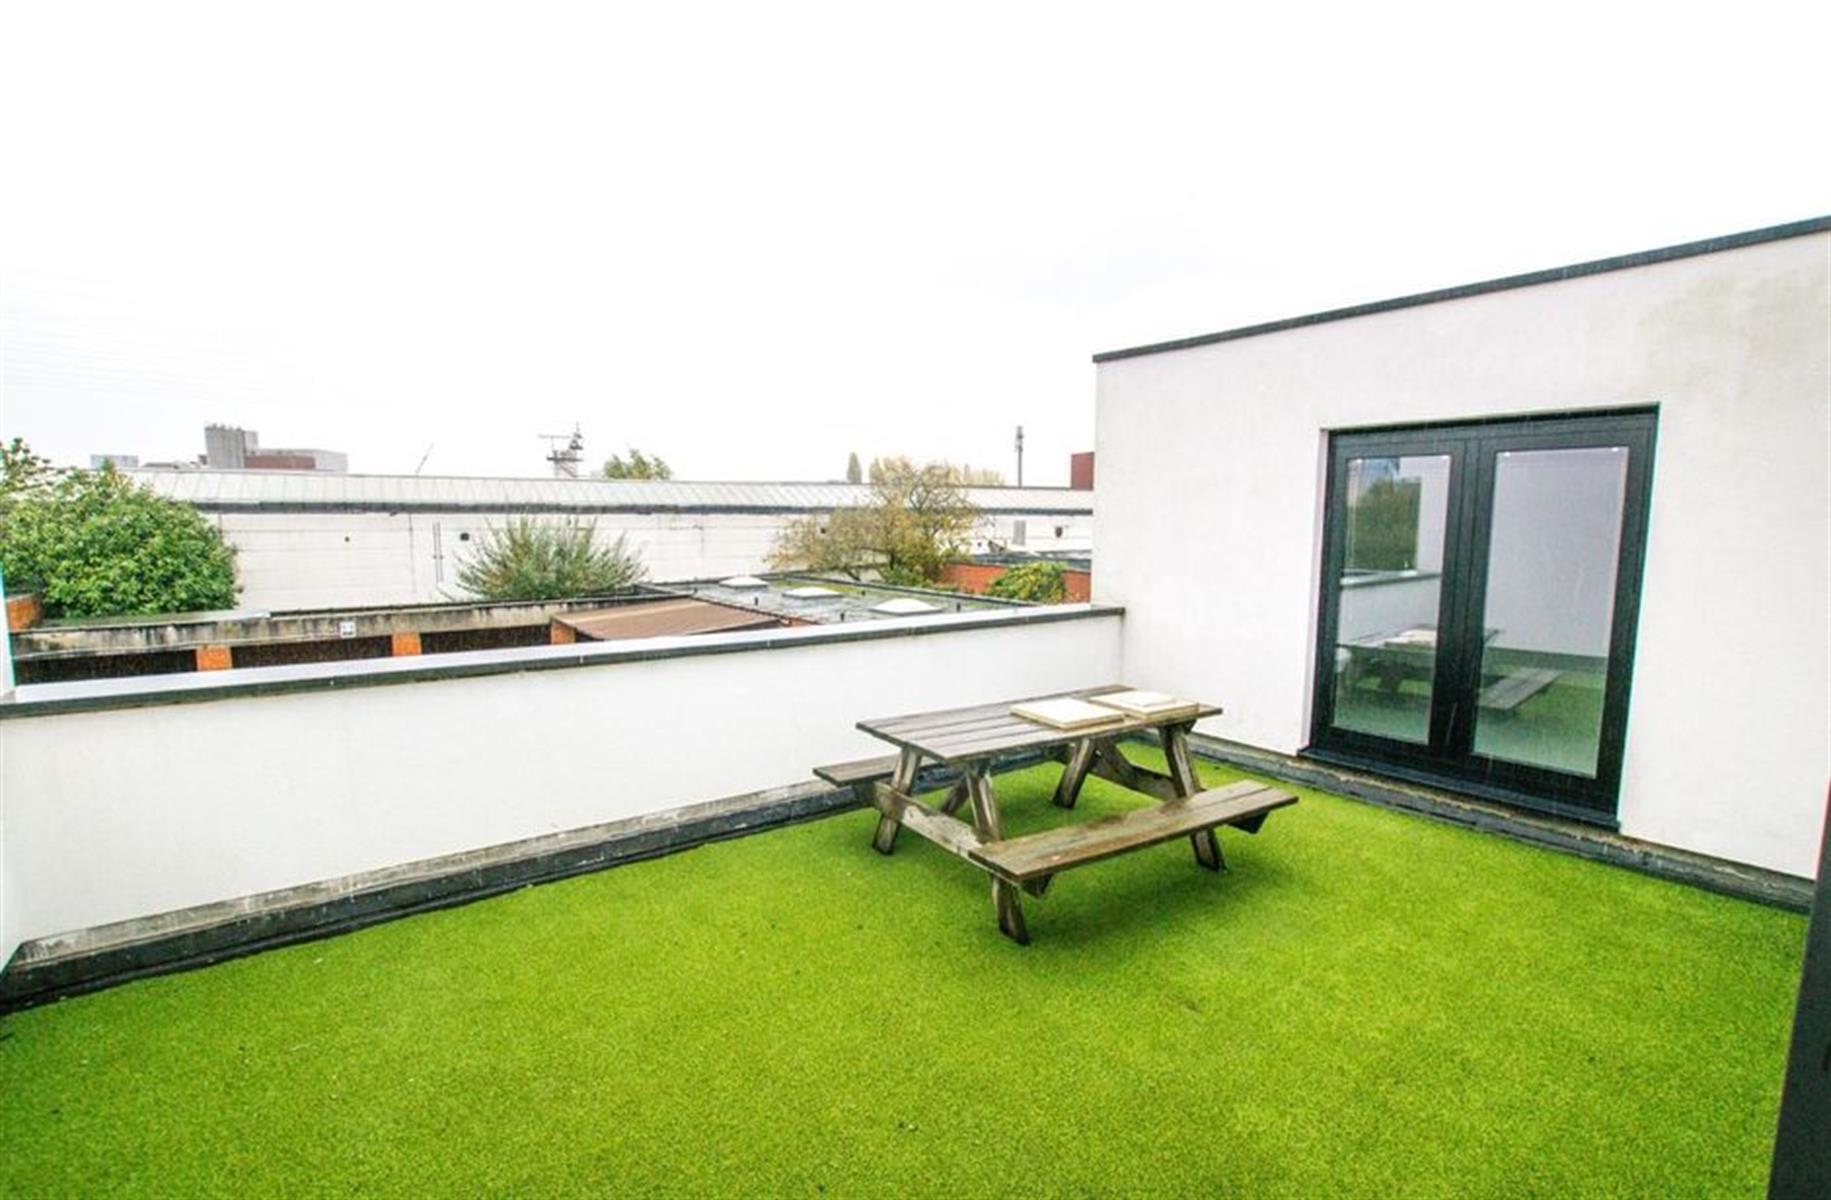 kantoor te huur K003 - Middelmolenlaan 96, 2100 Antwerpen Deurne, België 7